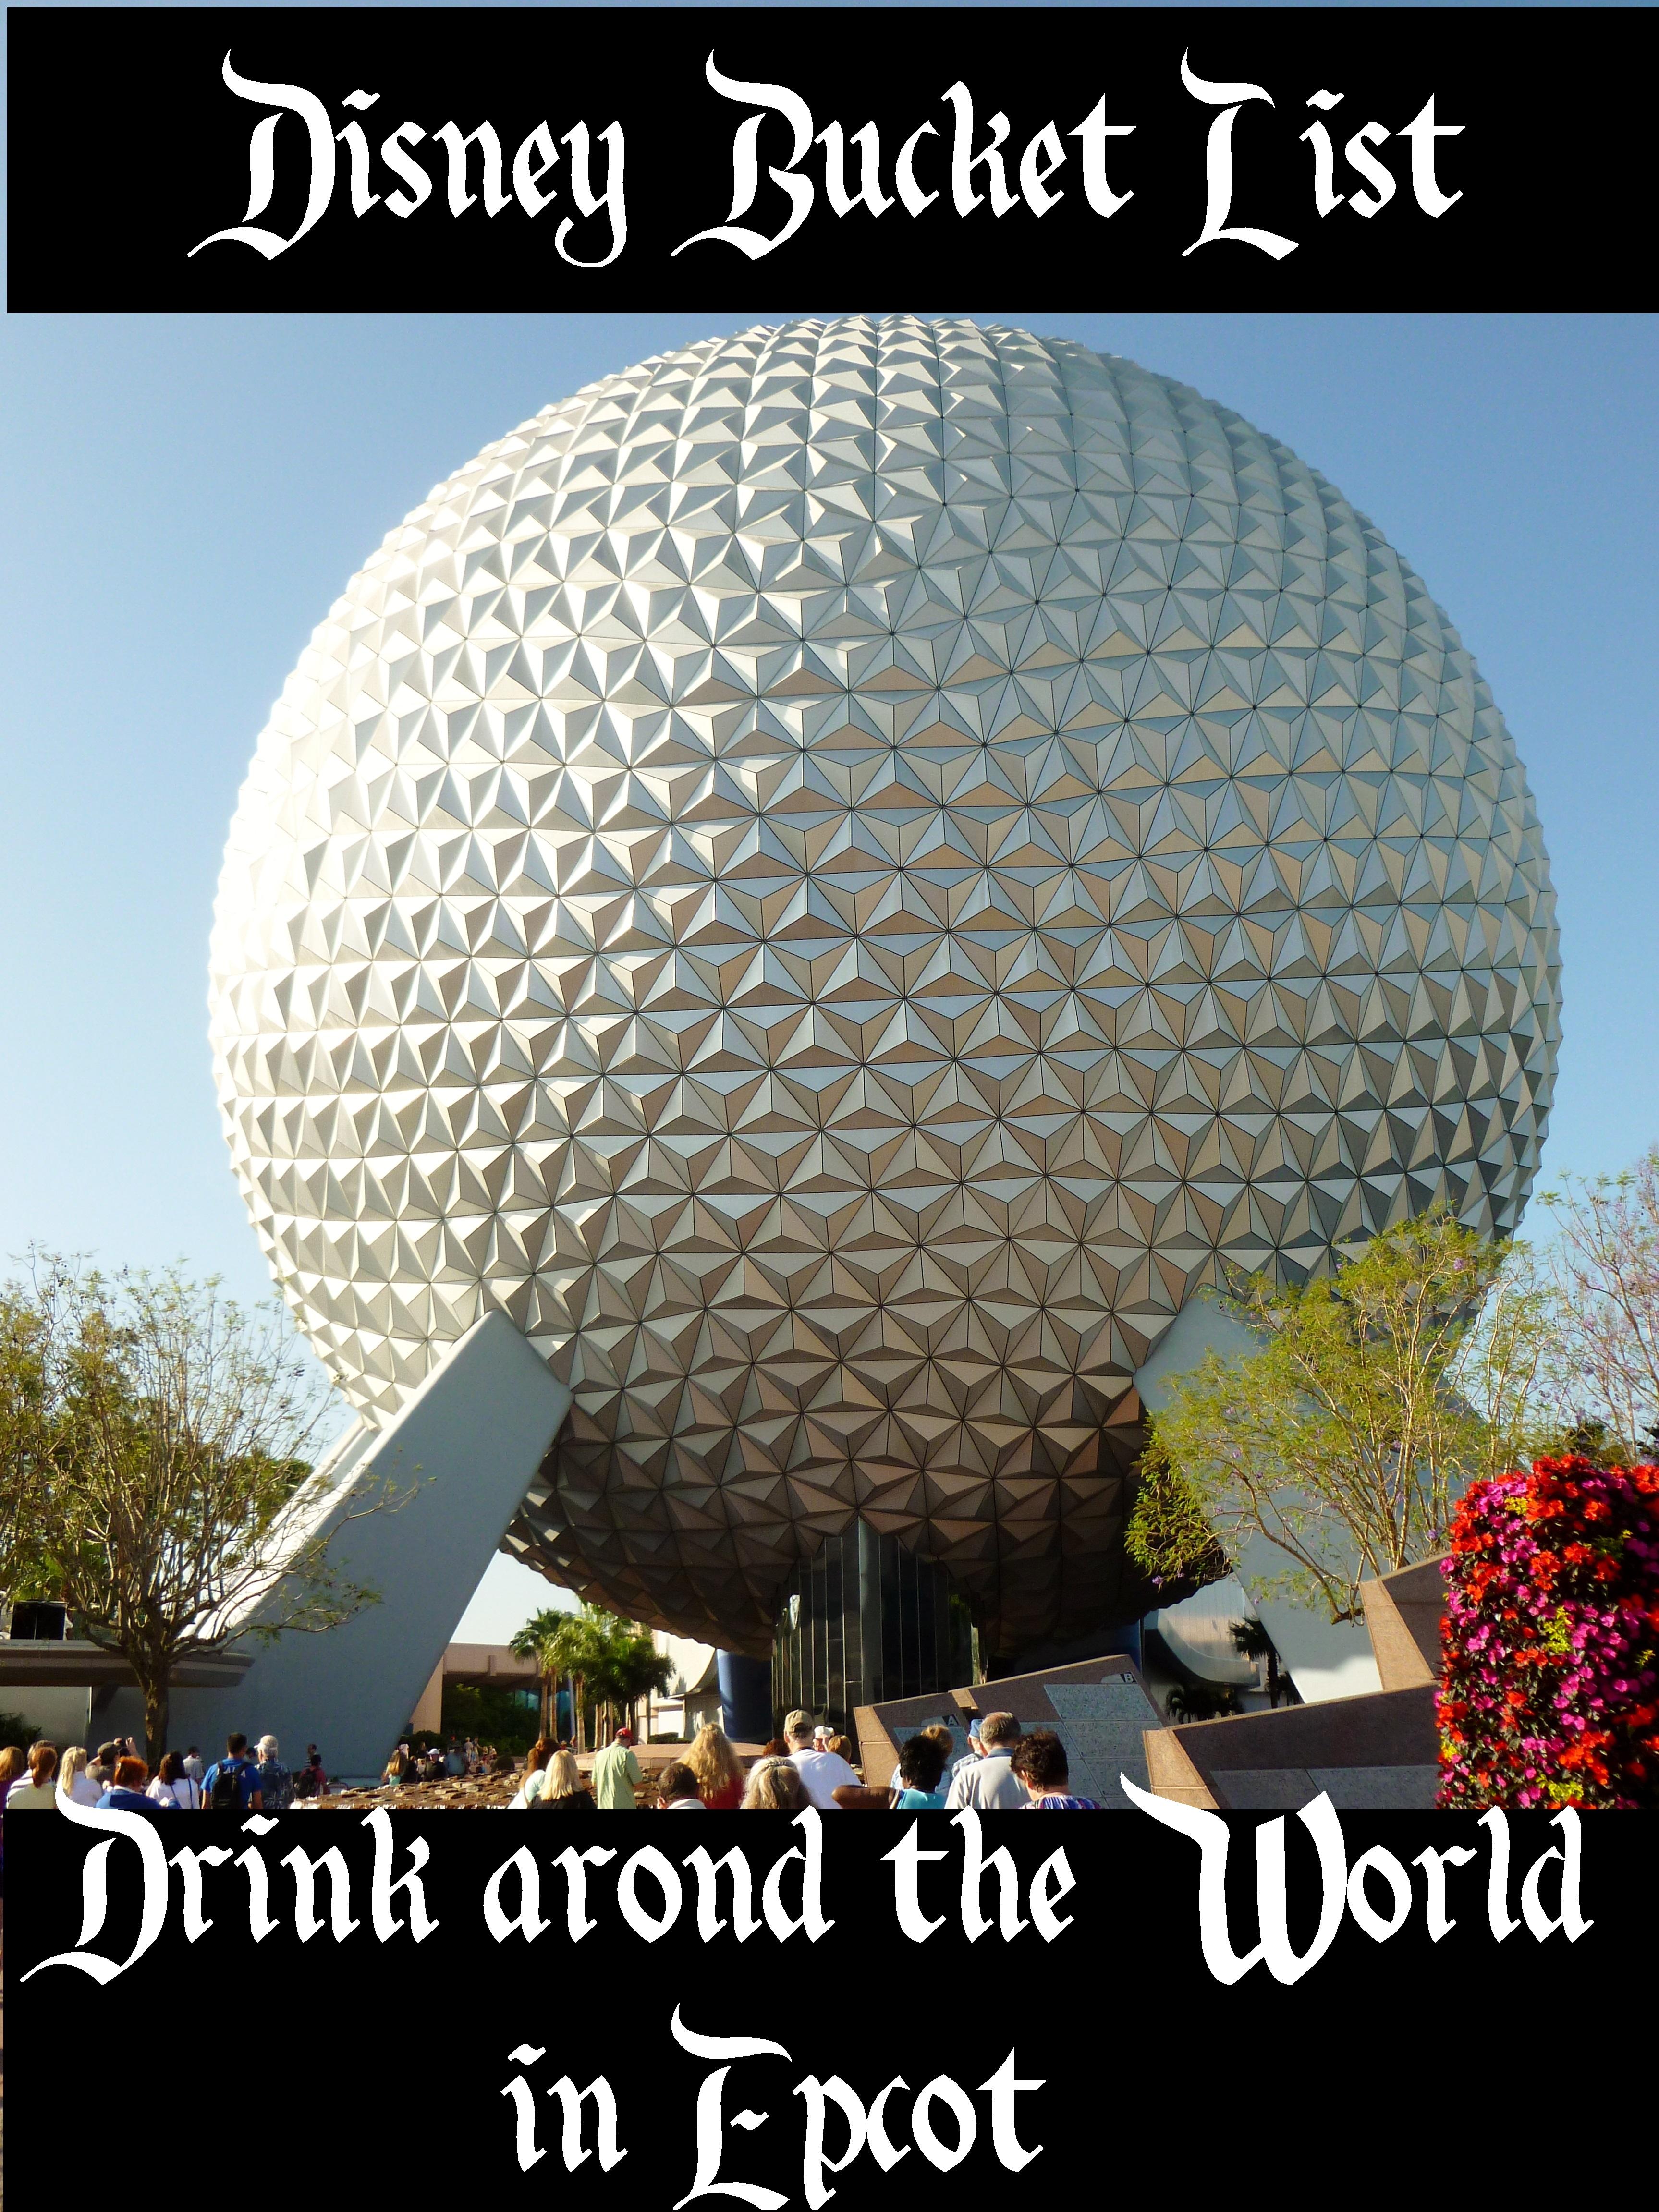 Fullsize Of Drink Around The World Epcot